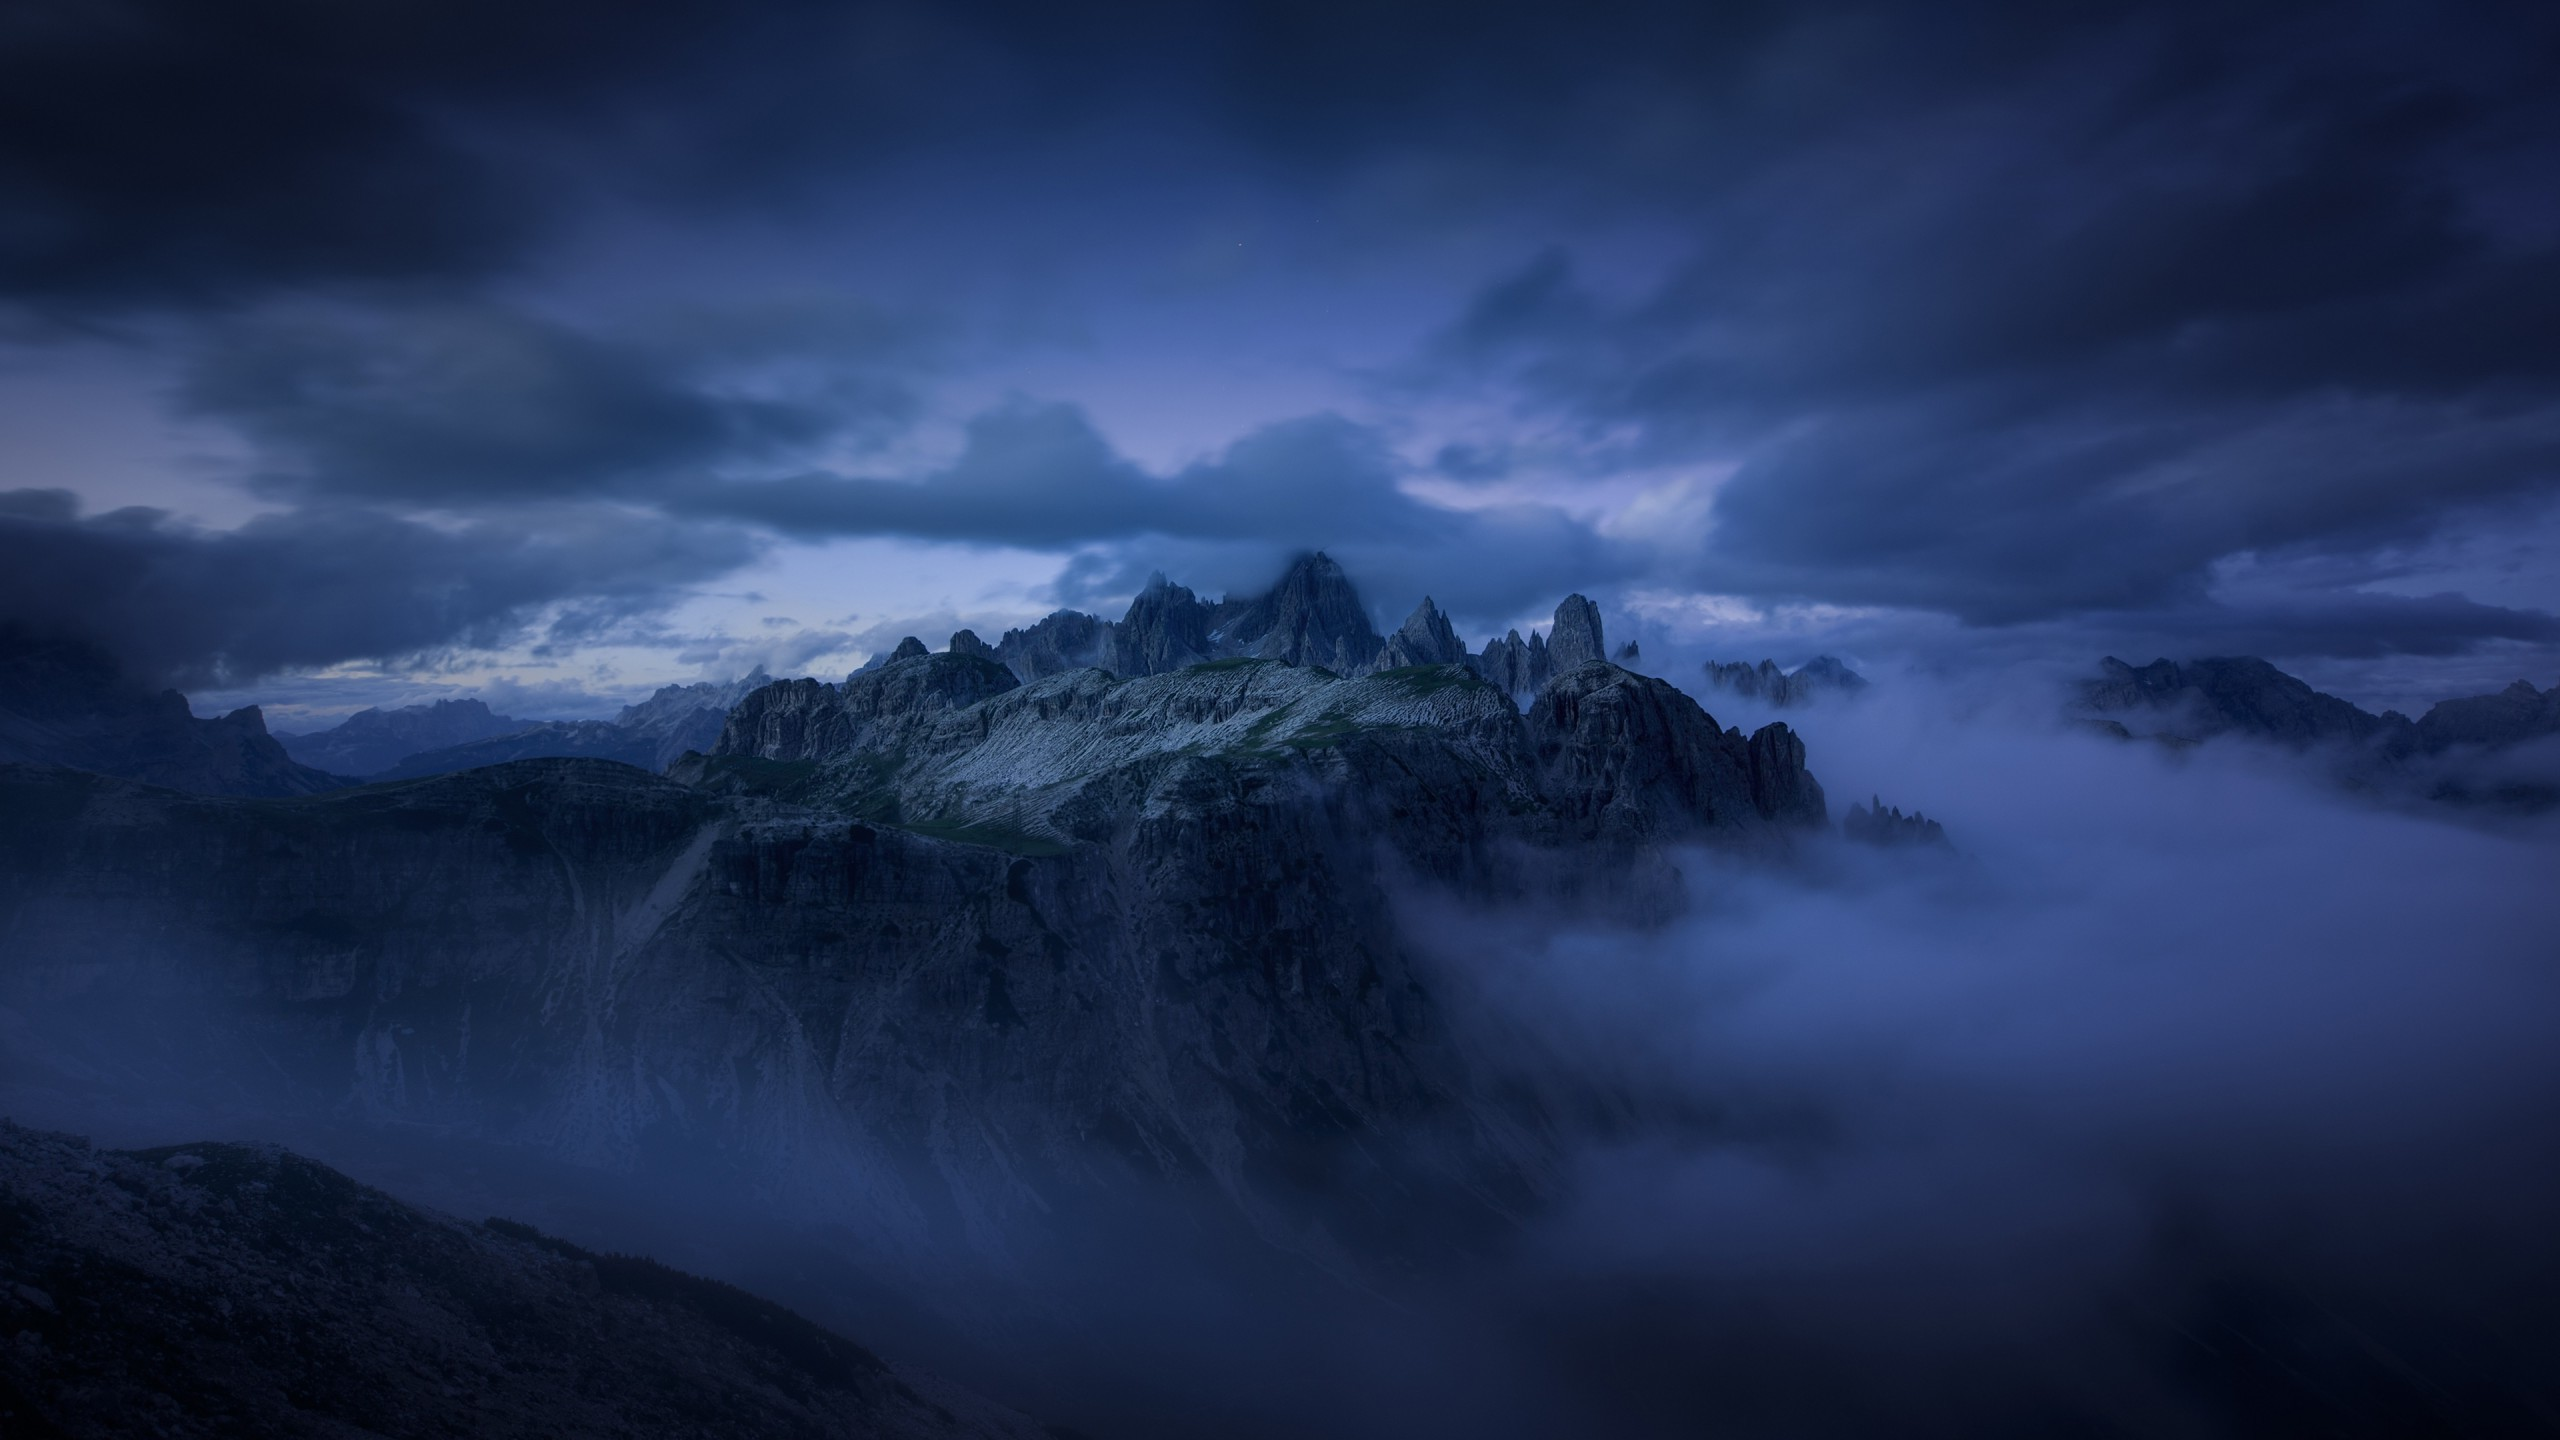 Res: 2560x1440, Mountain evening fog cliff dark clouds